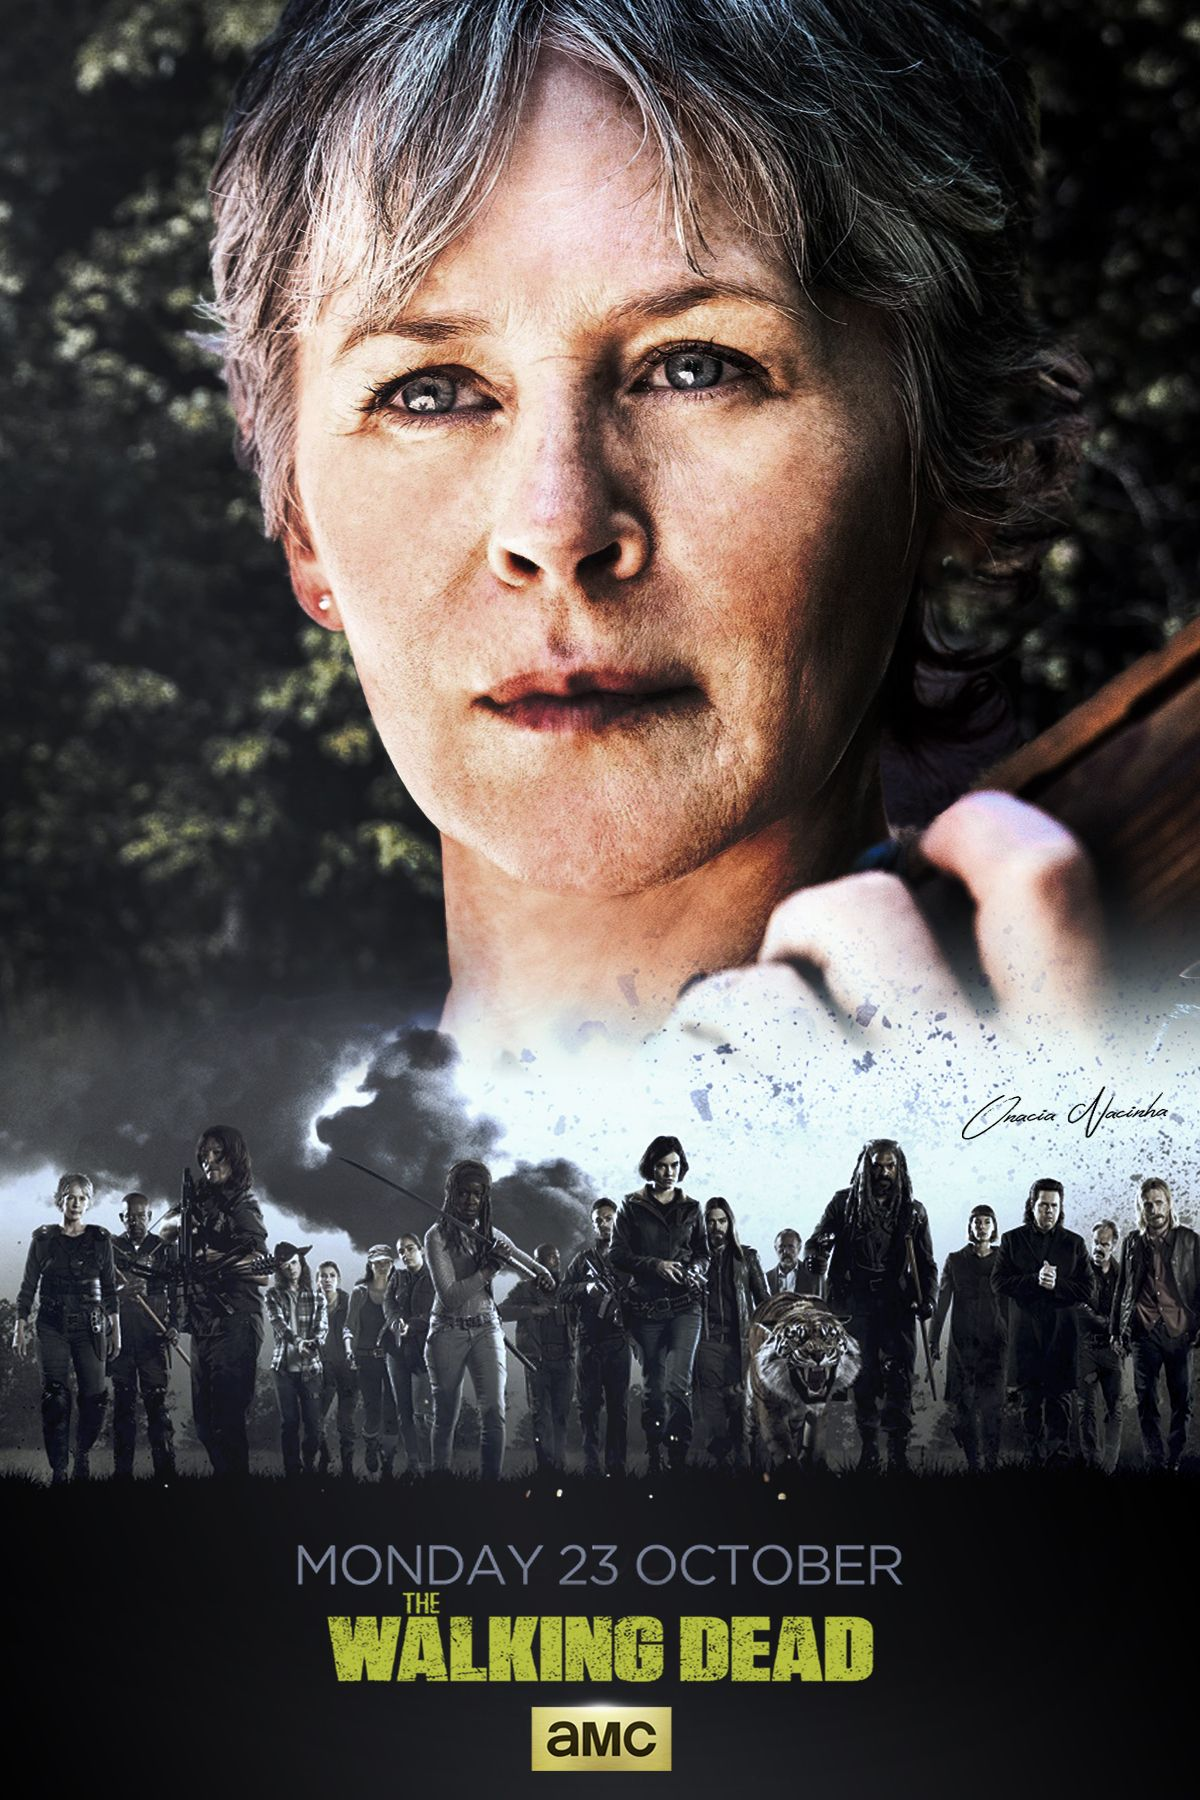 Walking Dead 2018 Wall Calendar Kalender 2018 The Walking Dead Walking Dead